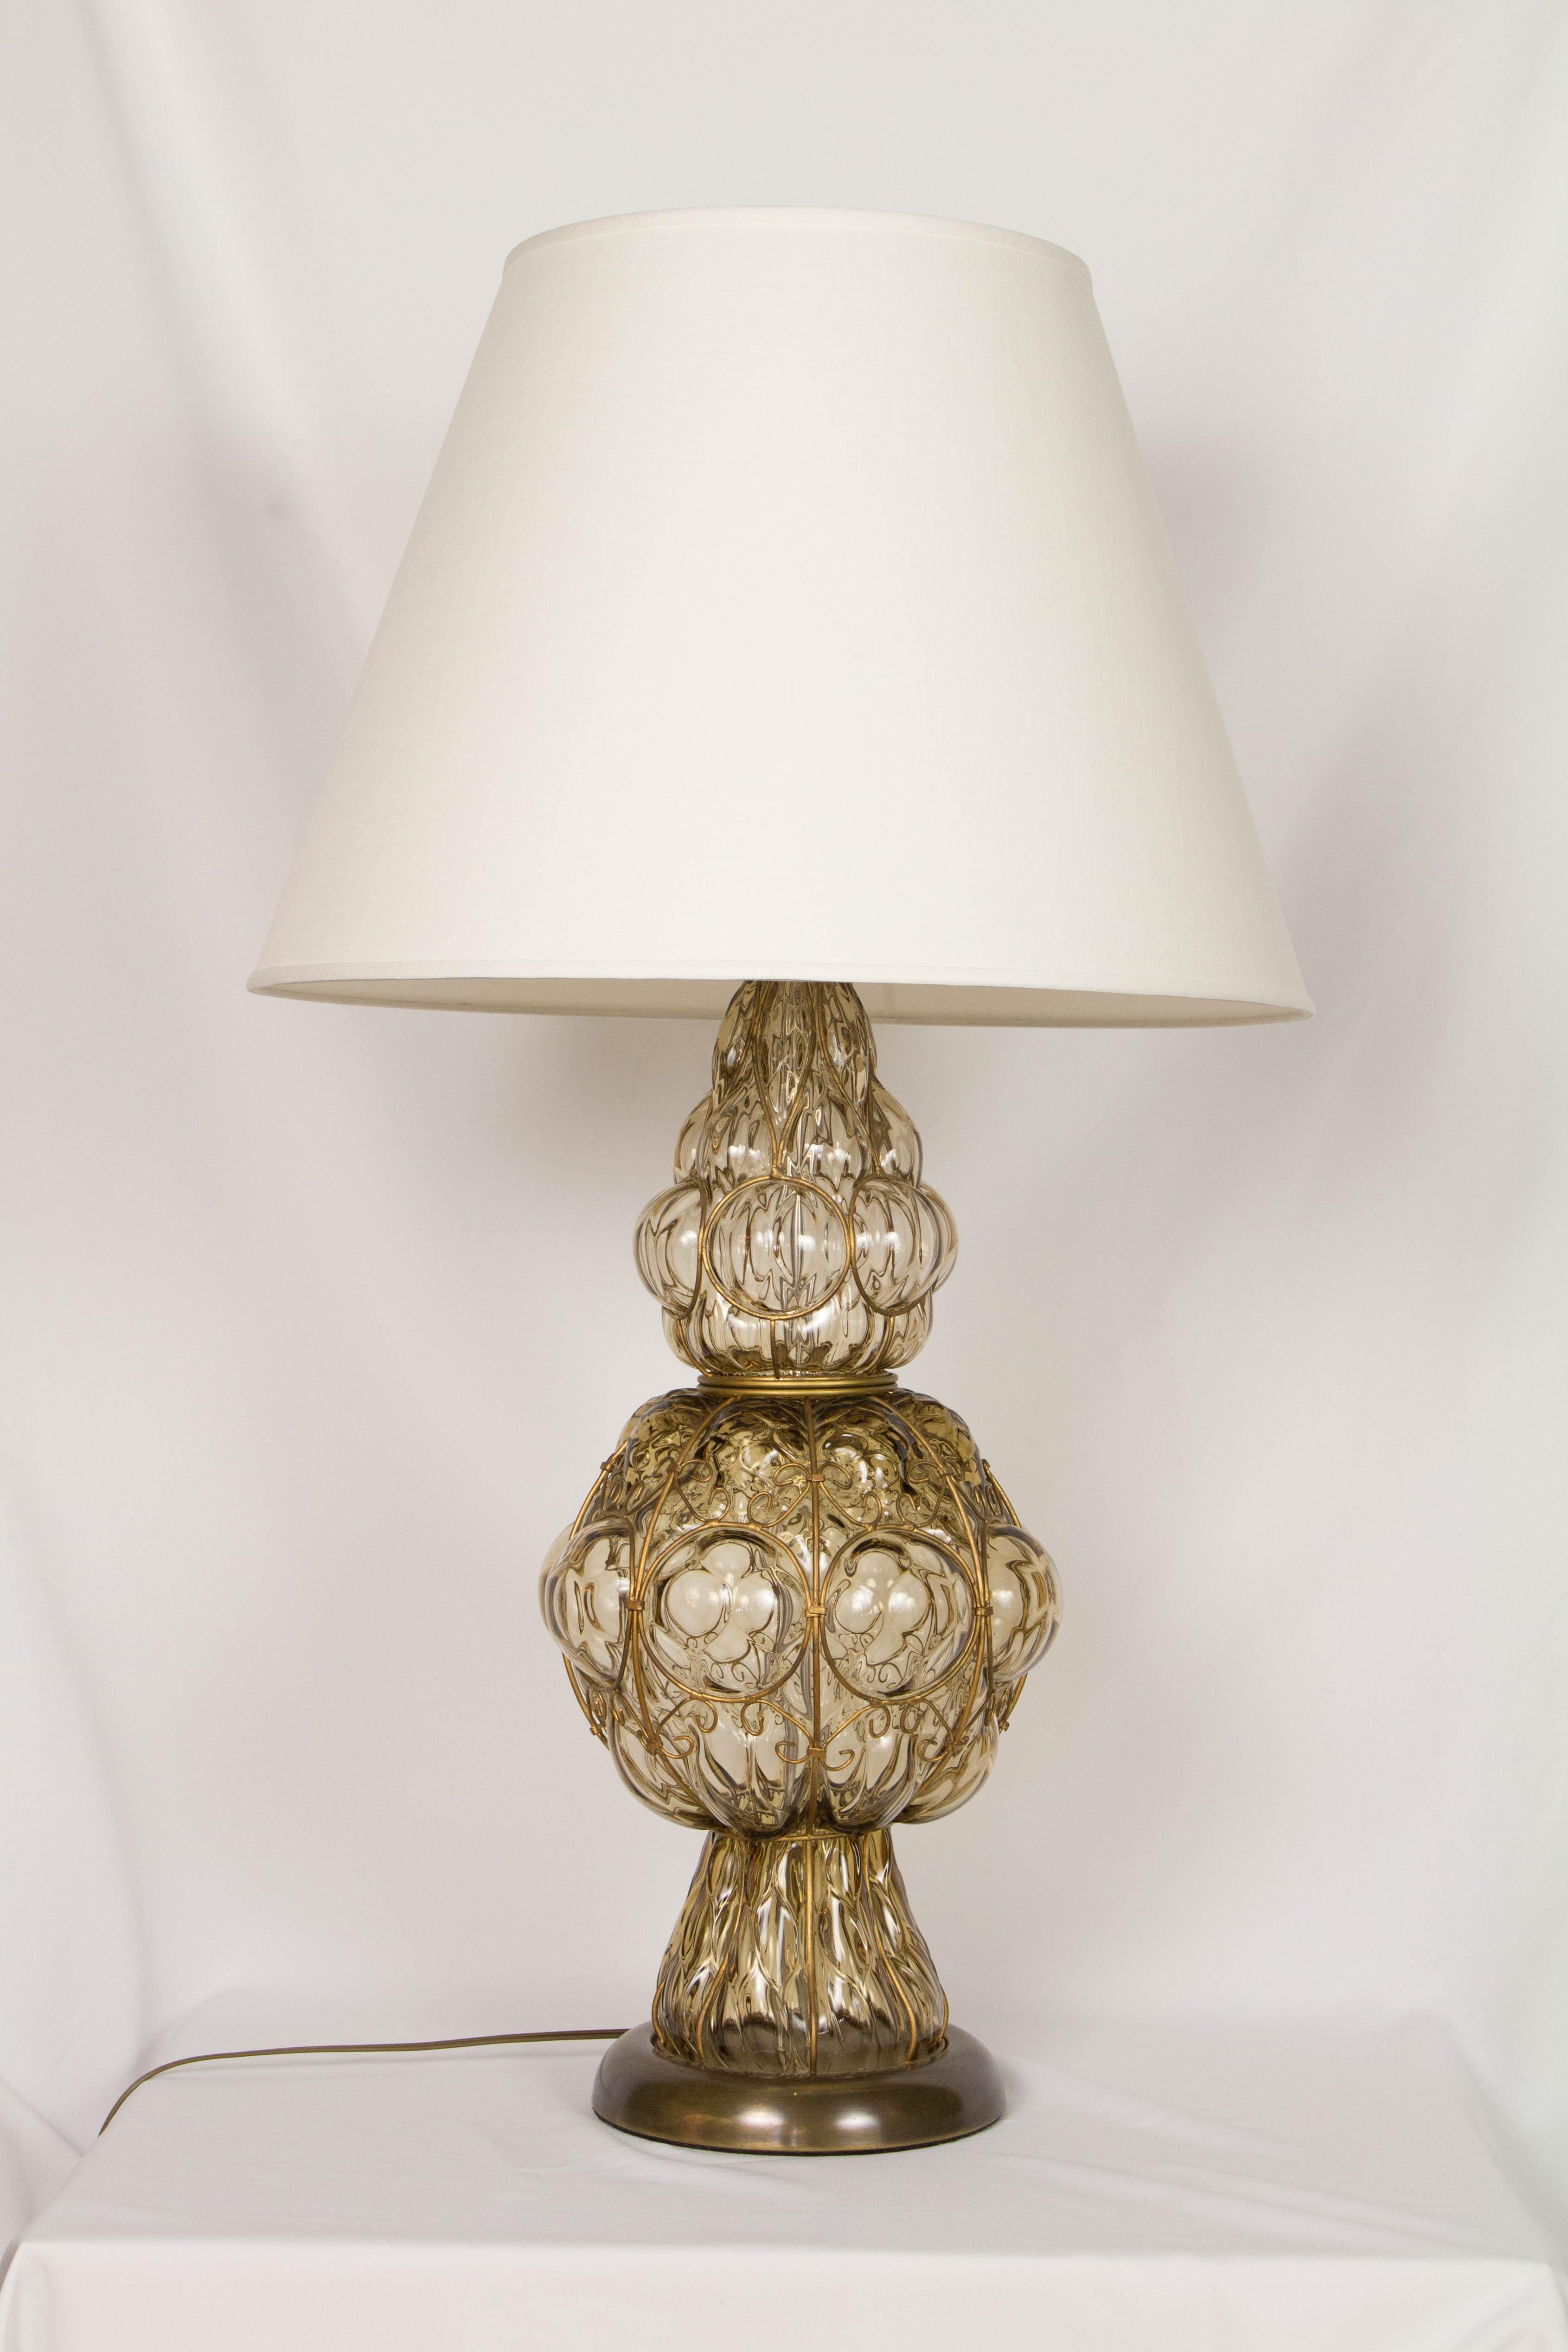 Marbro Murano Caged Glass Table Lamp Chairish